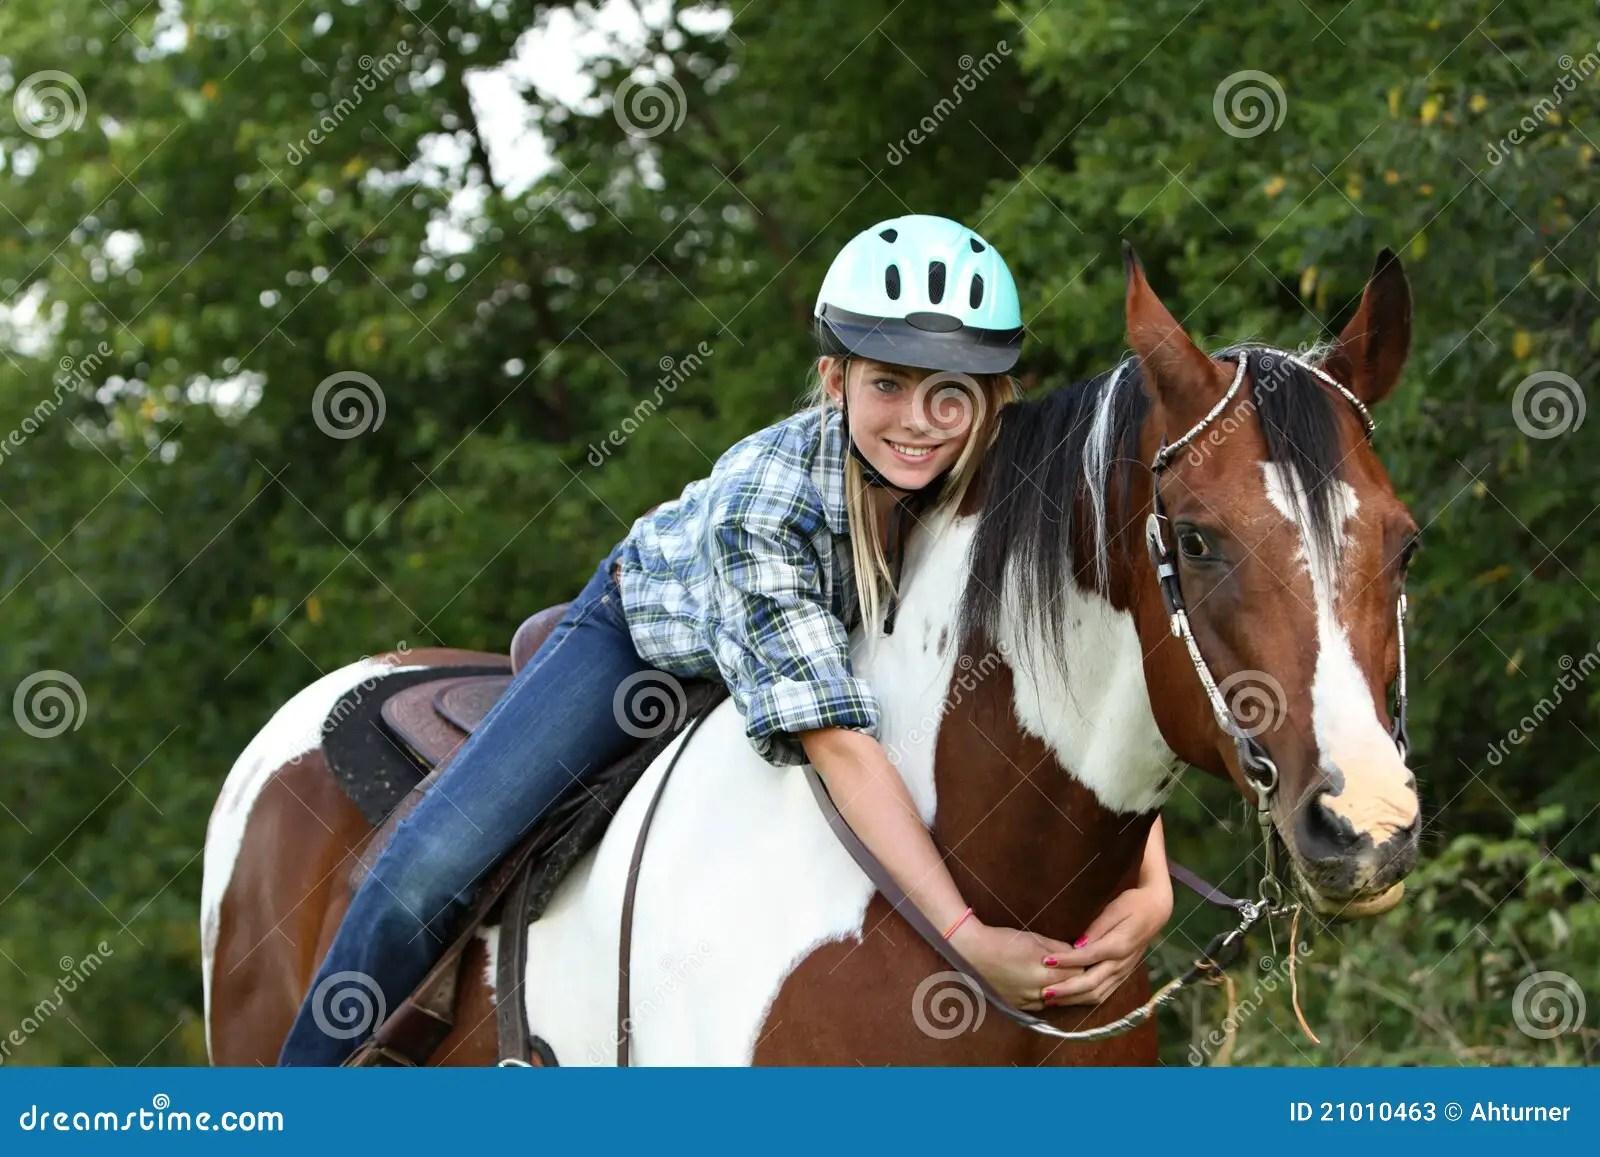 Horse Hug Stock Photos Image 21010463